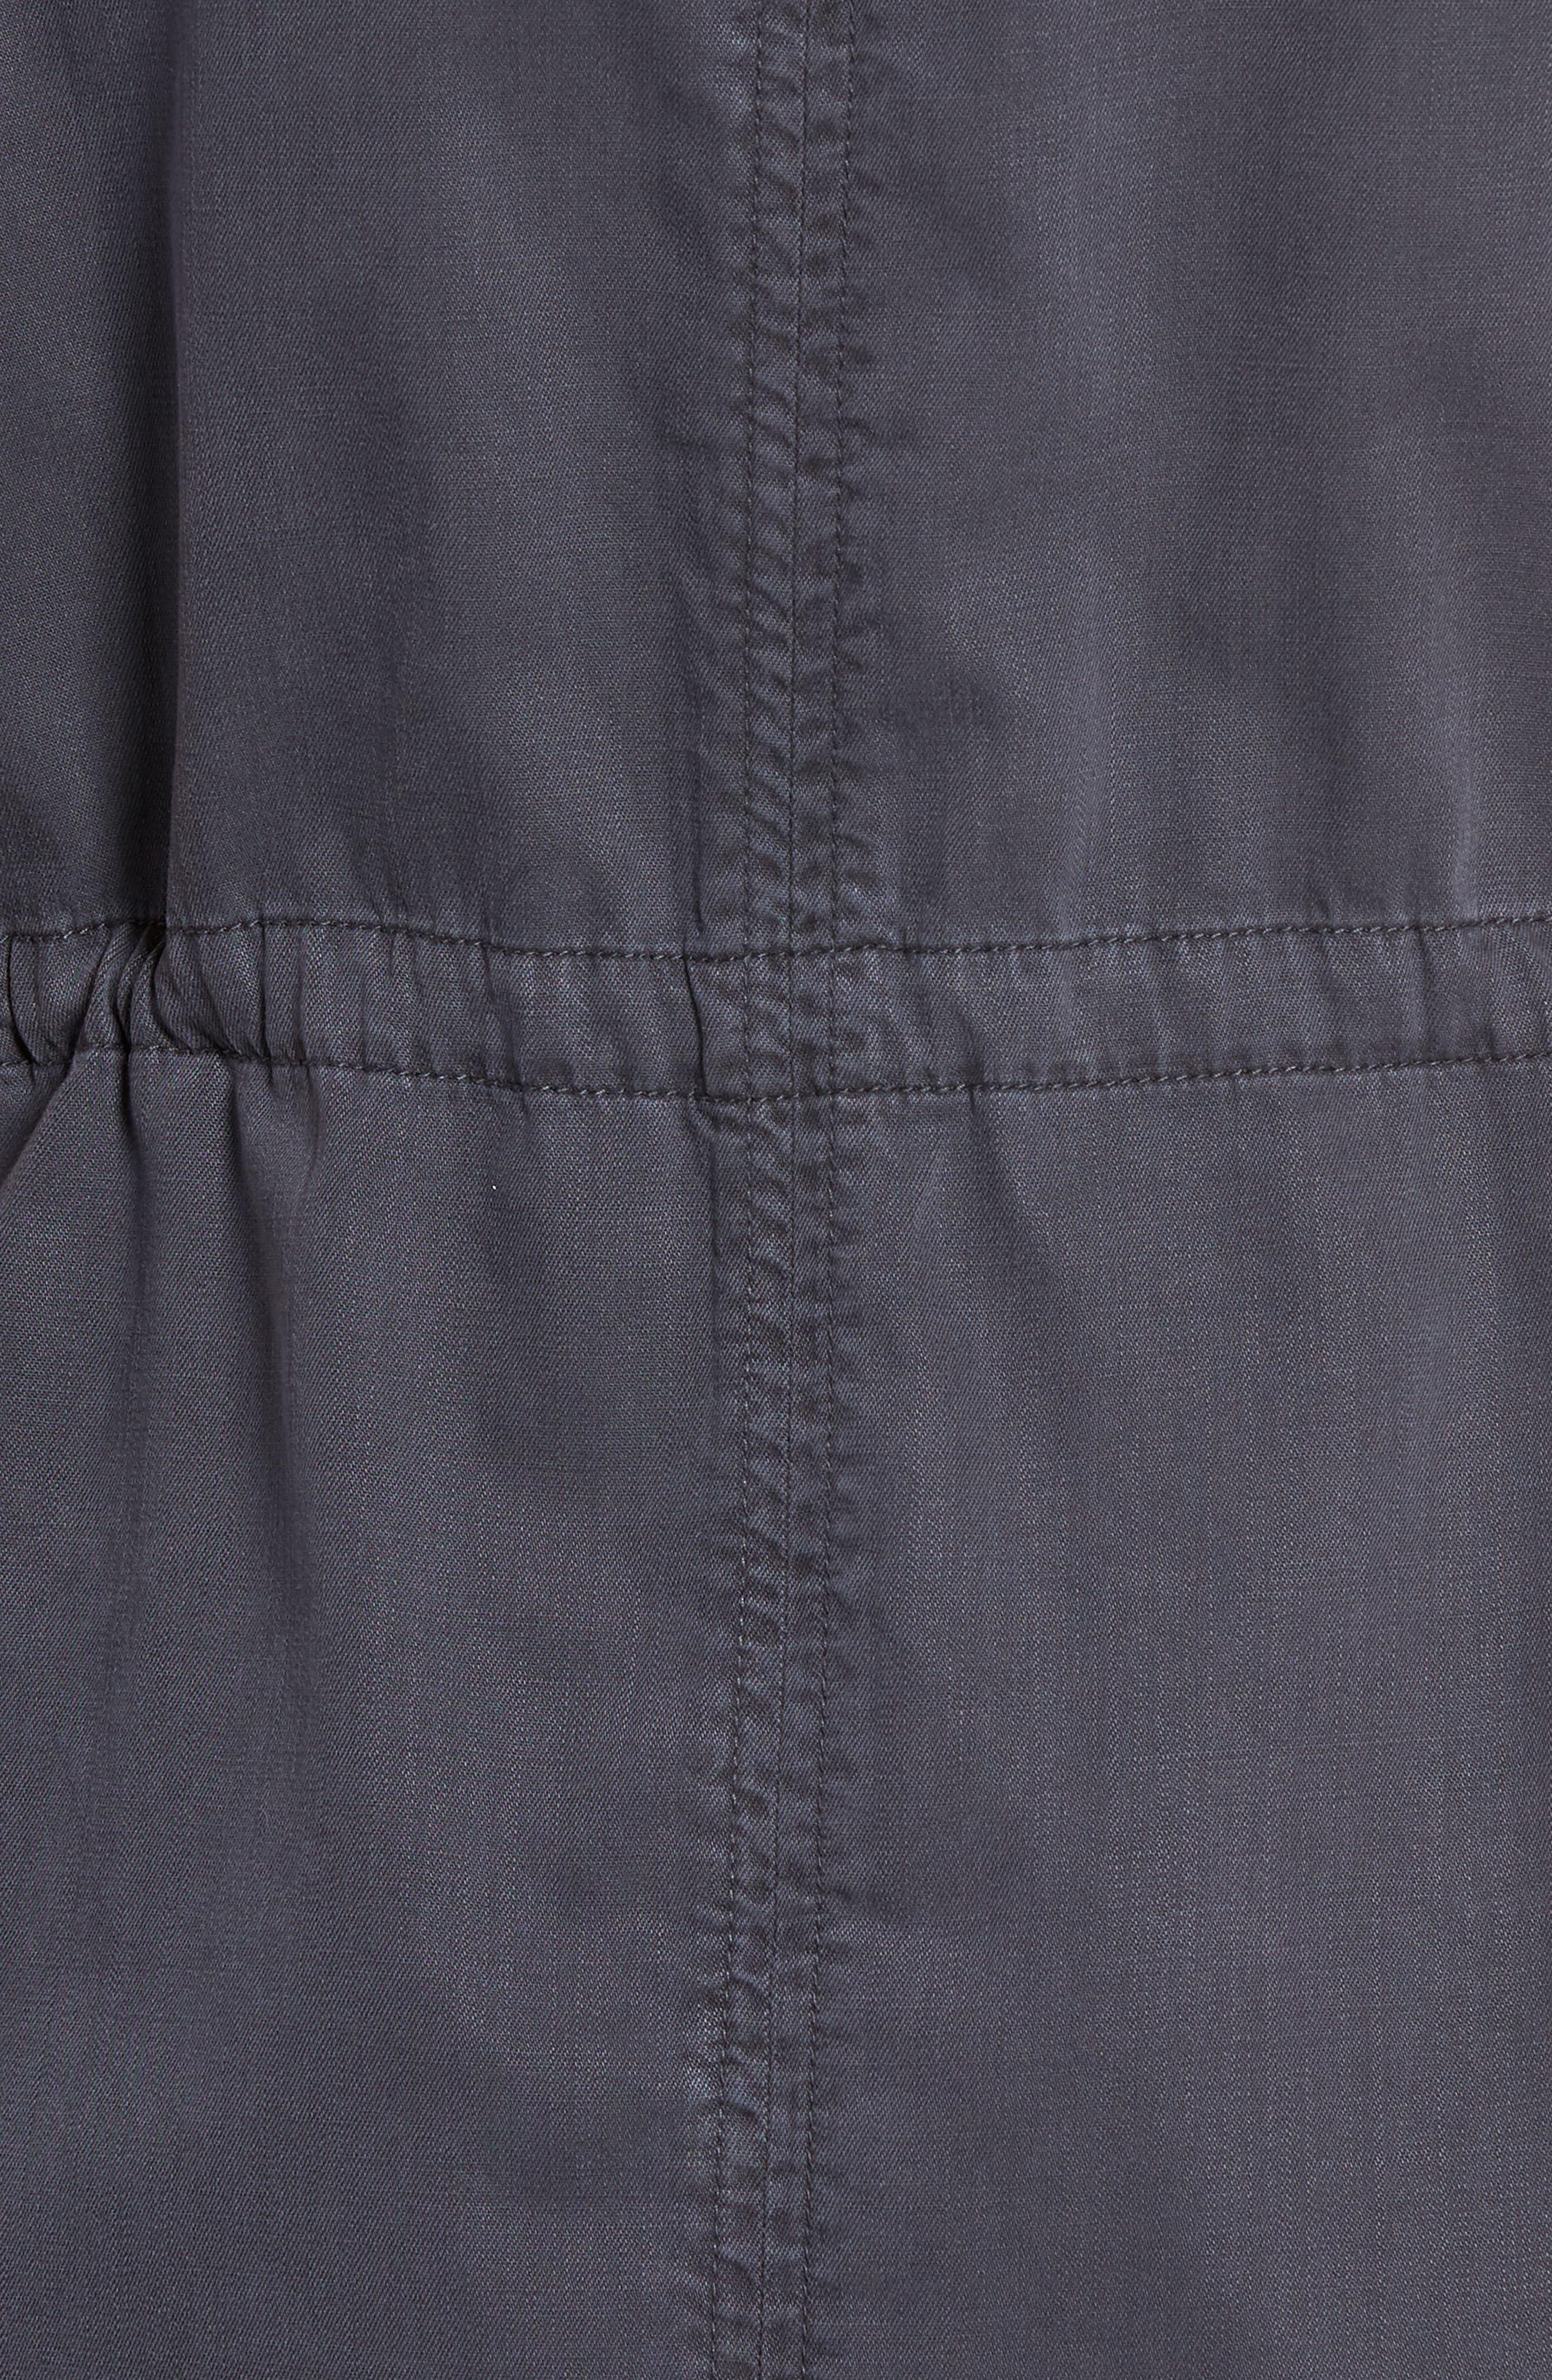 Utility Vest,                             Alternate thumbnail 6, color,                             Grey Ebony